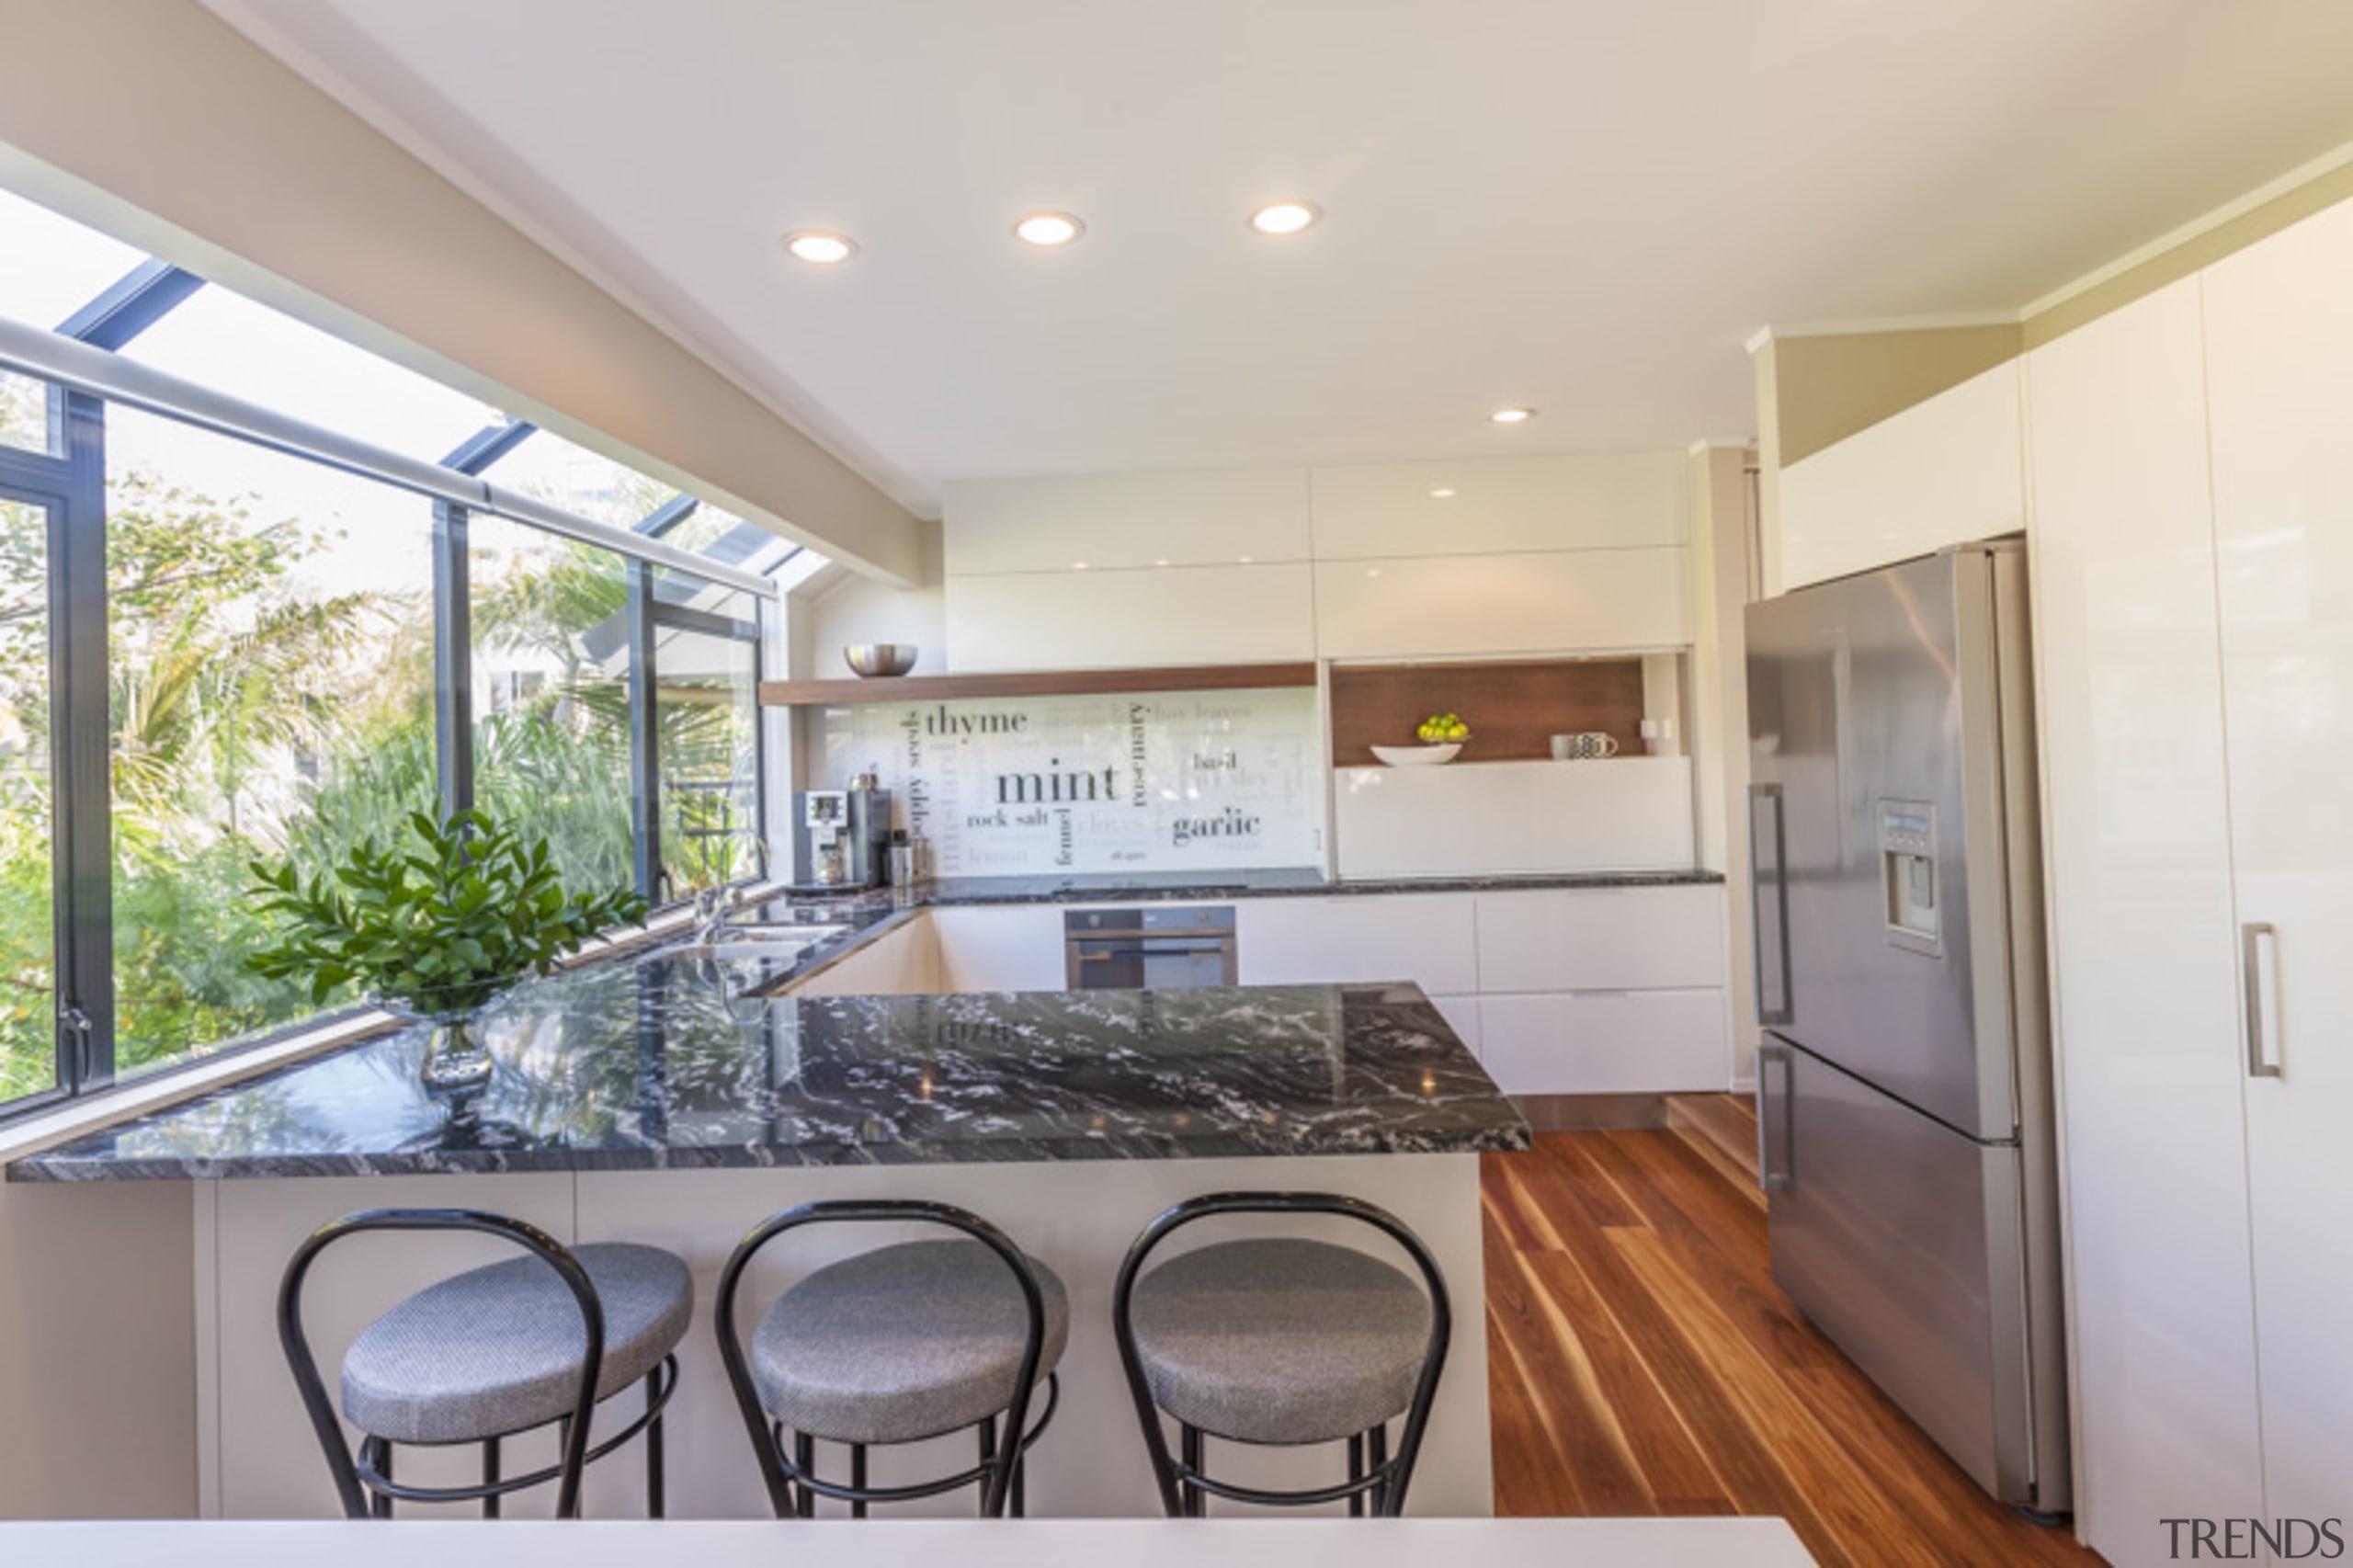 St. Heliers II - countertop | estate | countertop, estate, house, interior design, kitchen, property, real estate, gray